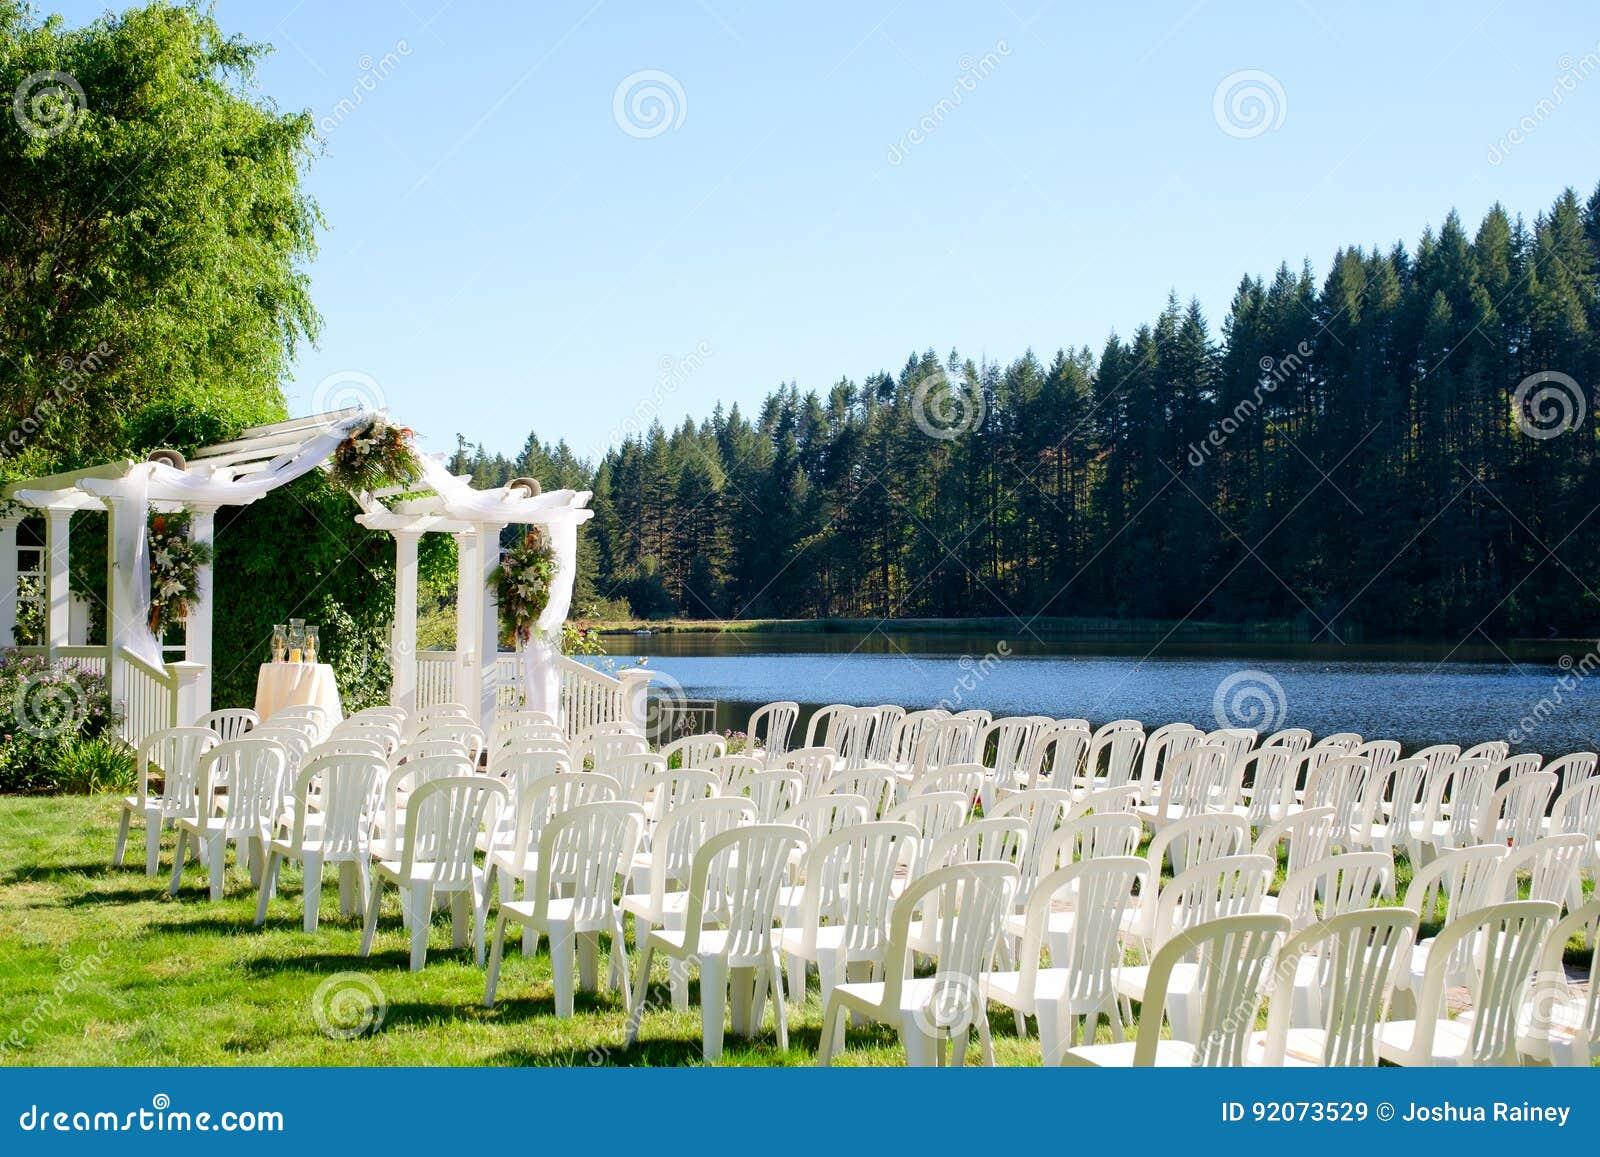 Oregon Wedding Venue By Lake Stock Image - Image of love ...